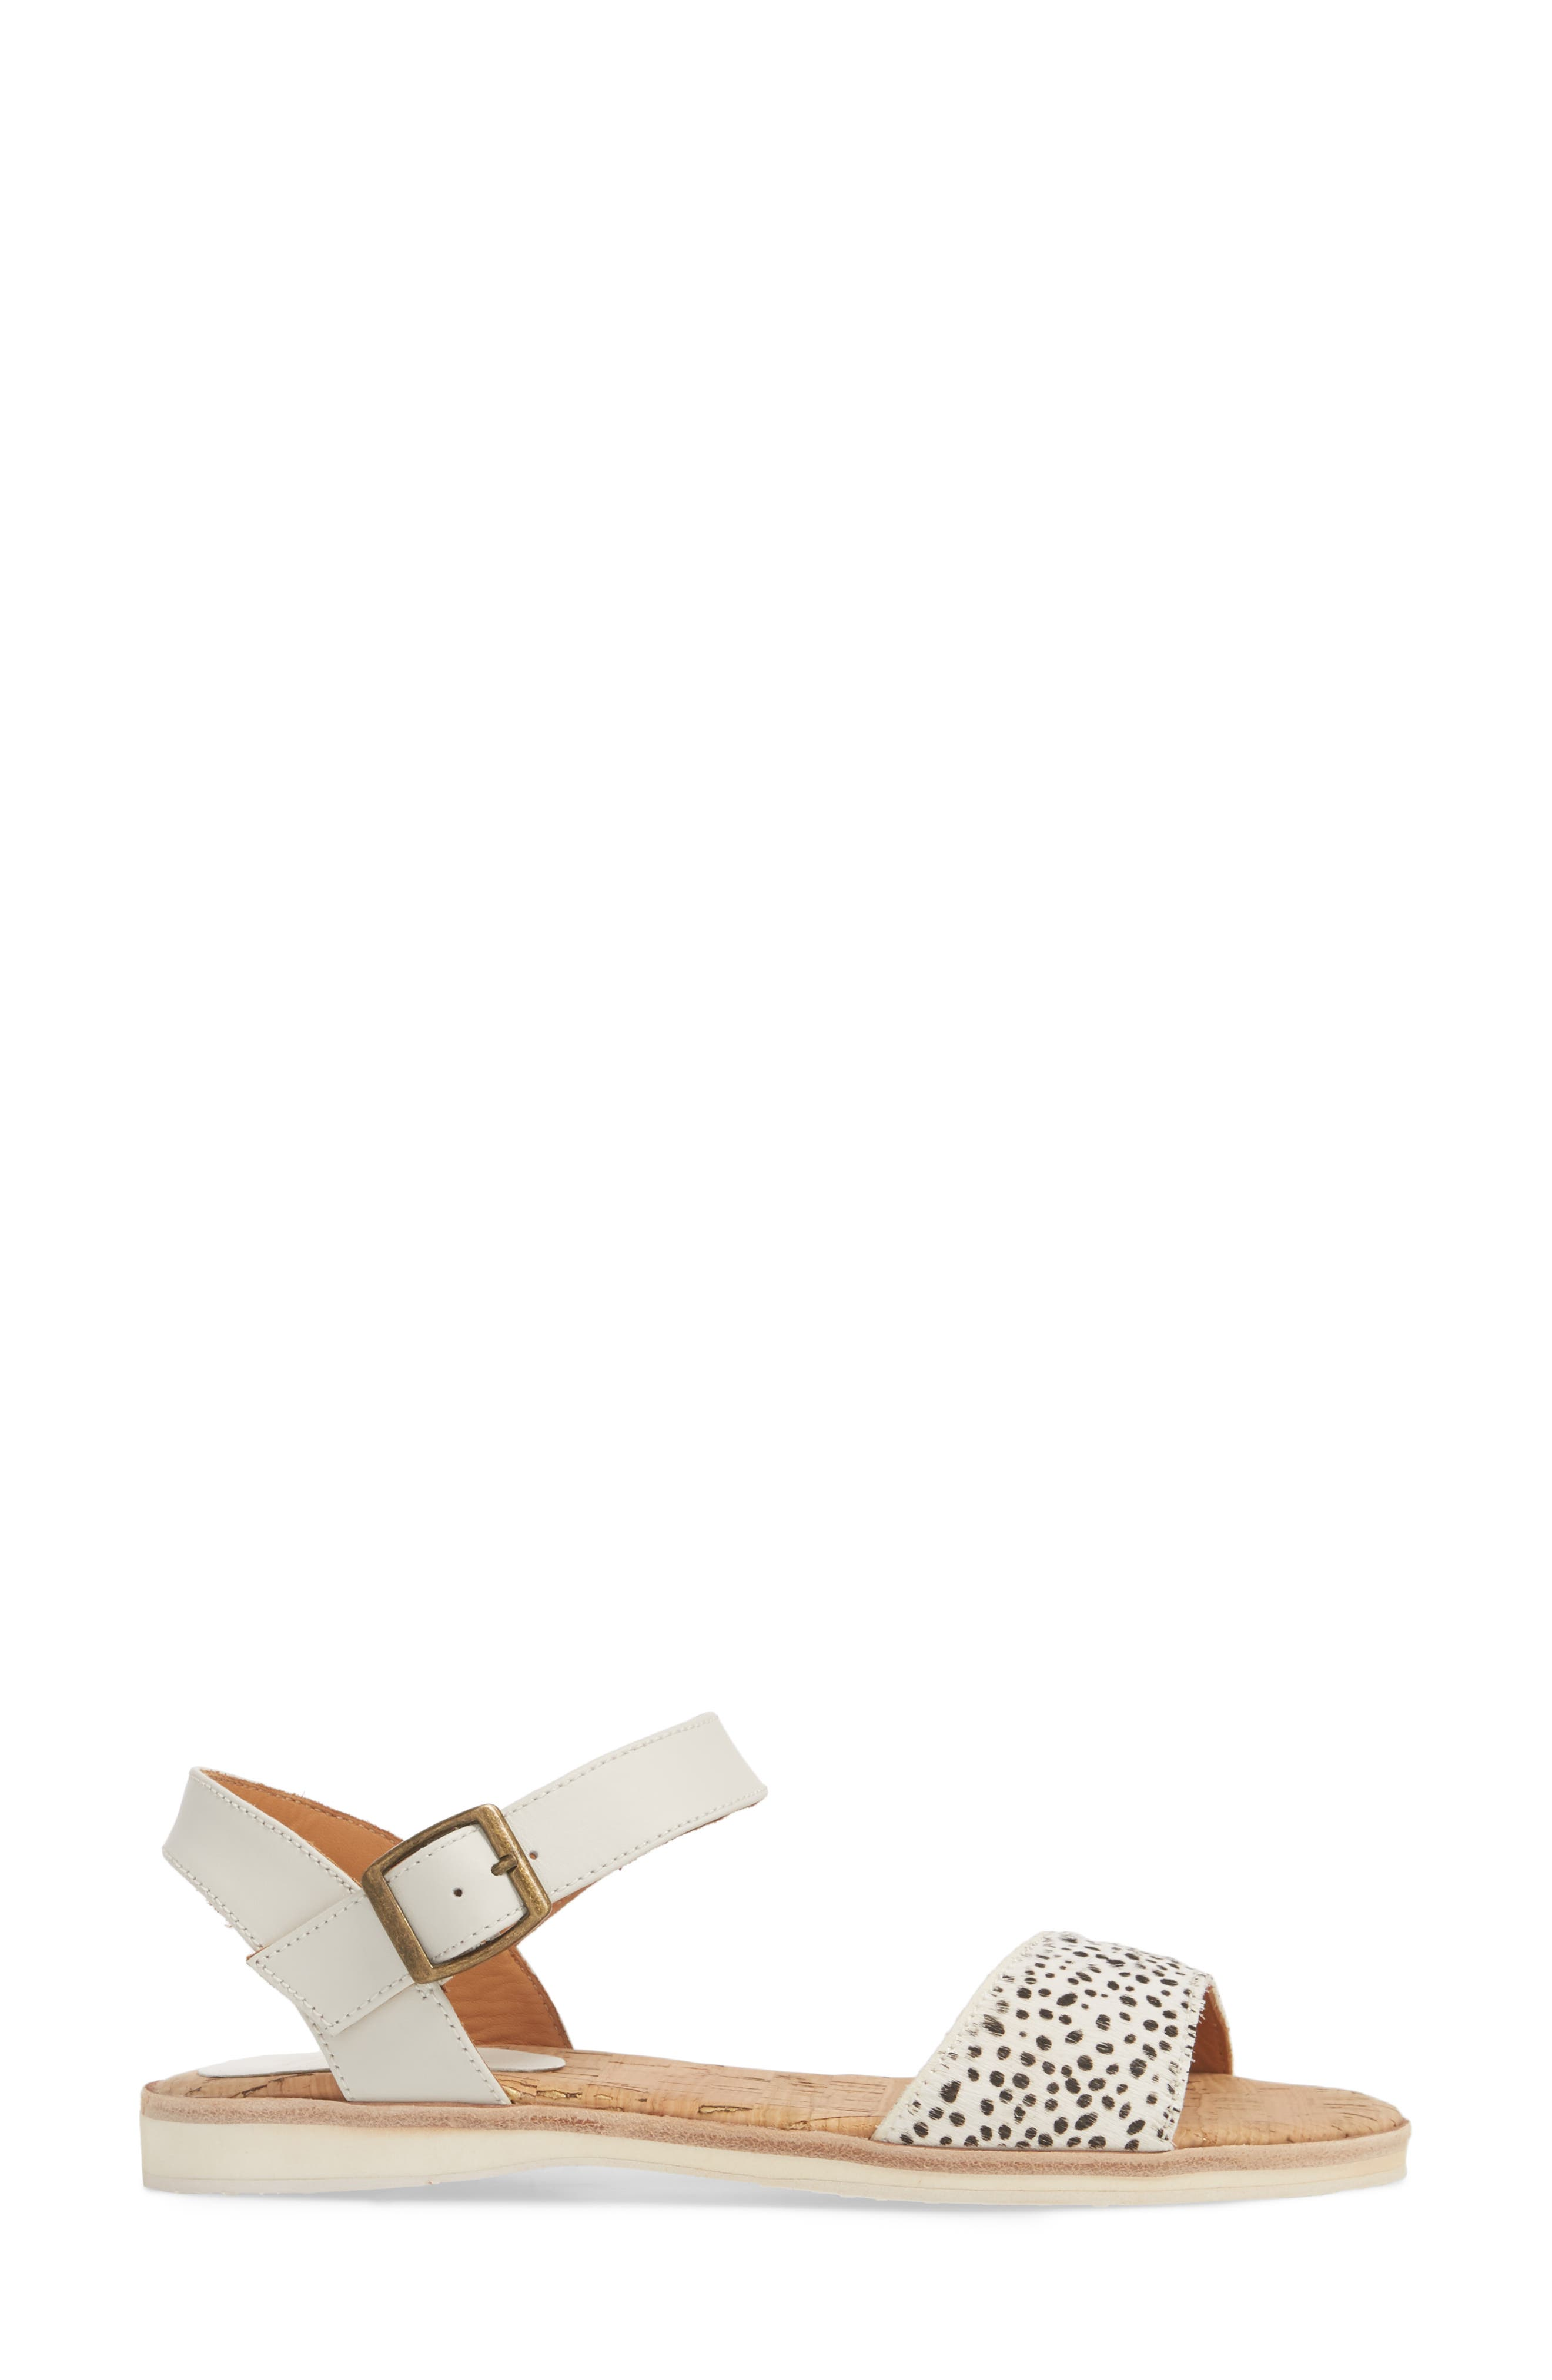 Genuine Calf Hair Sandal,                             Alternate thumbnail 6, color,                             Snow Leopard/ White Leather